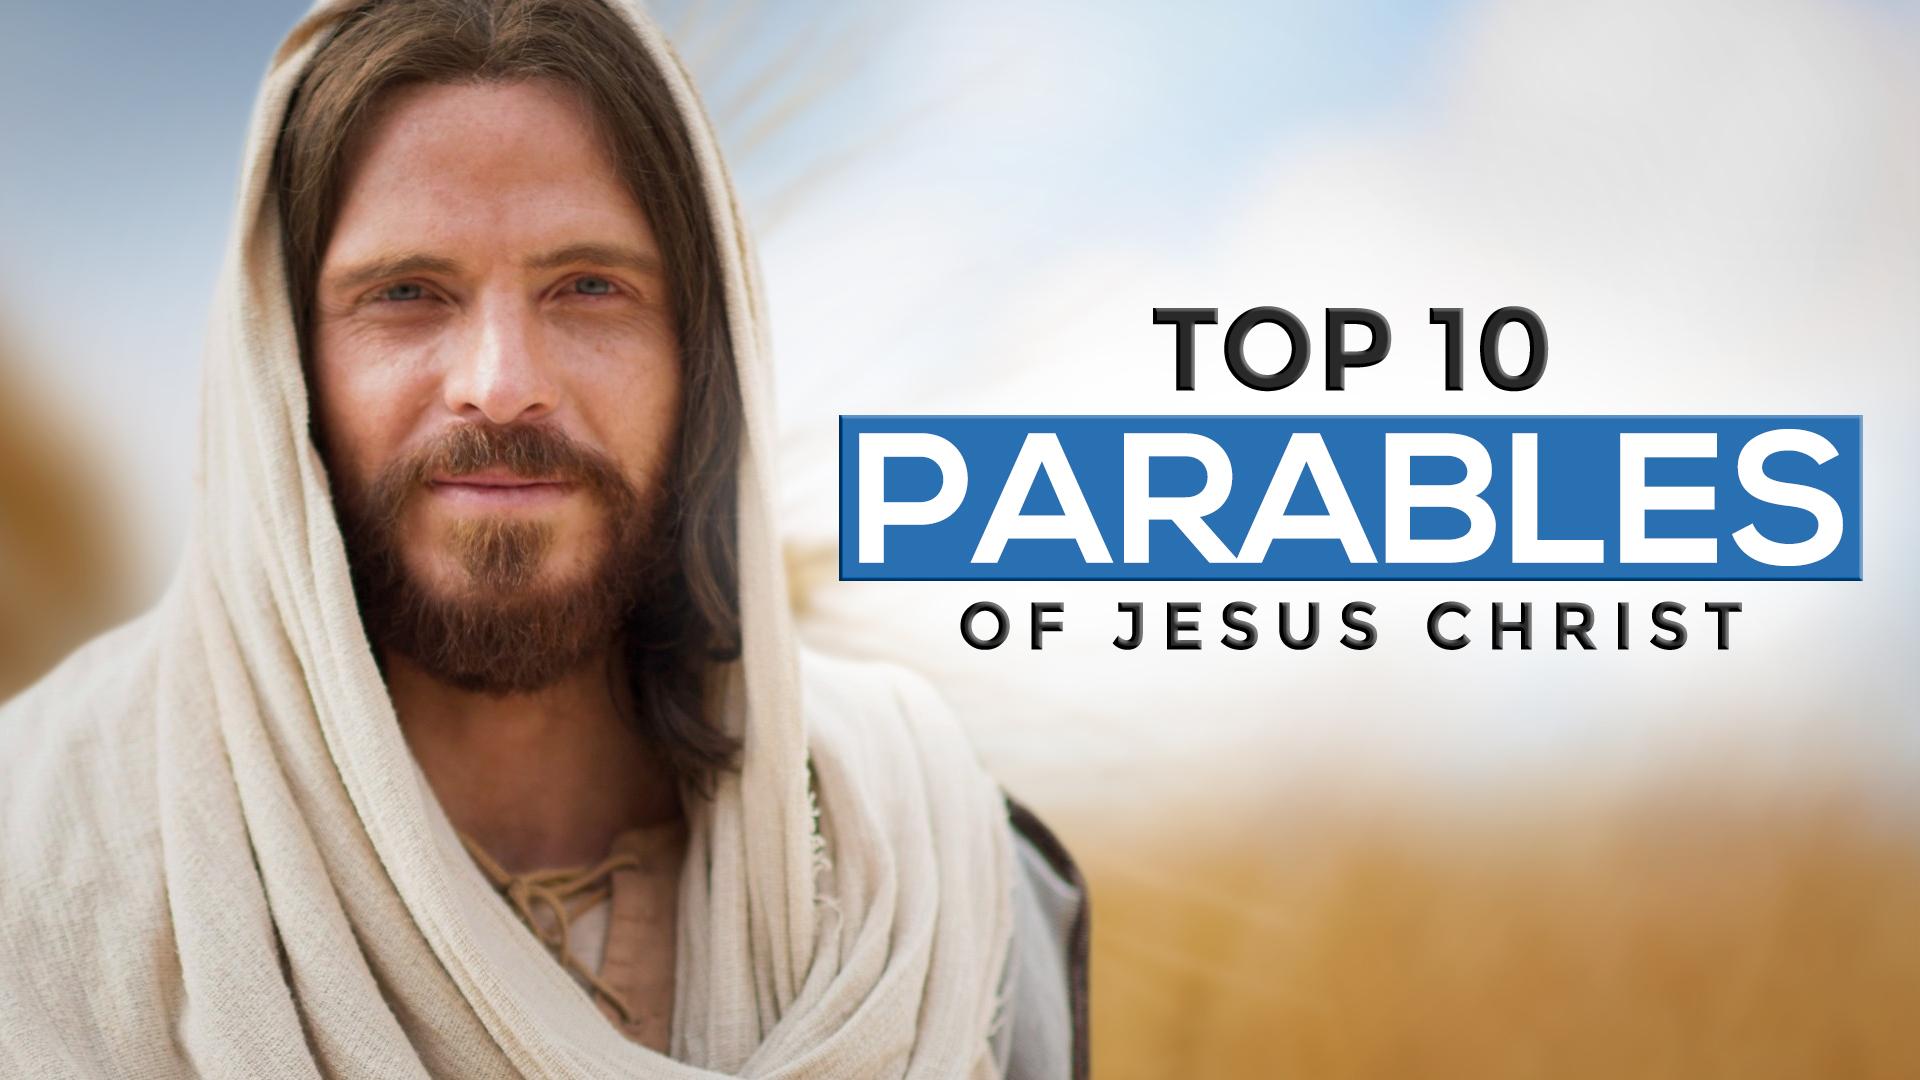 Top 10 Parables of Jesus Christ